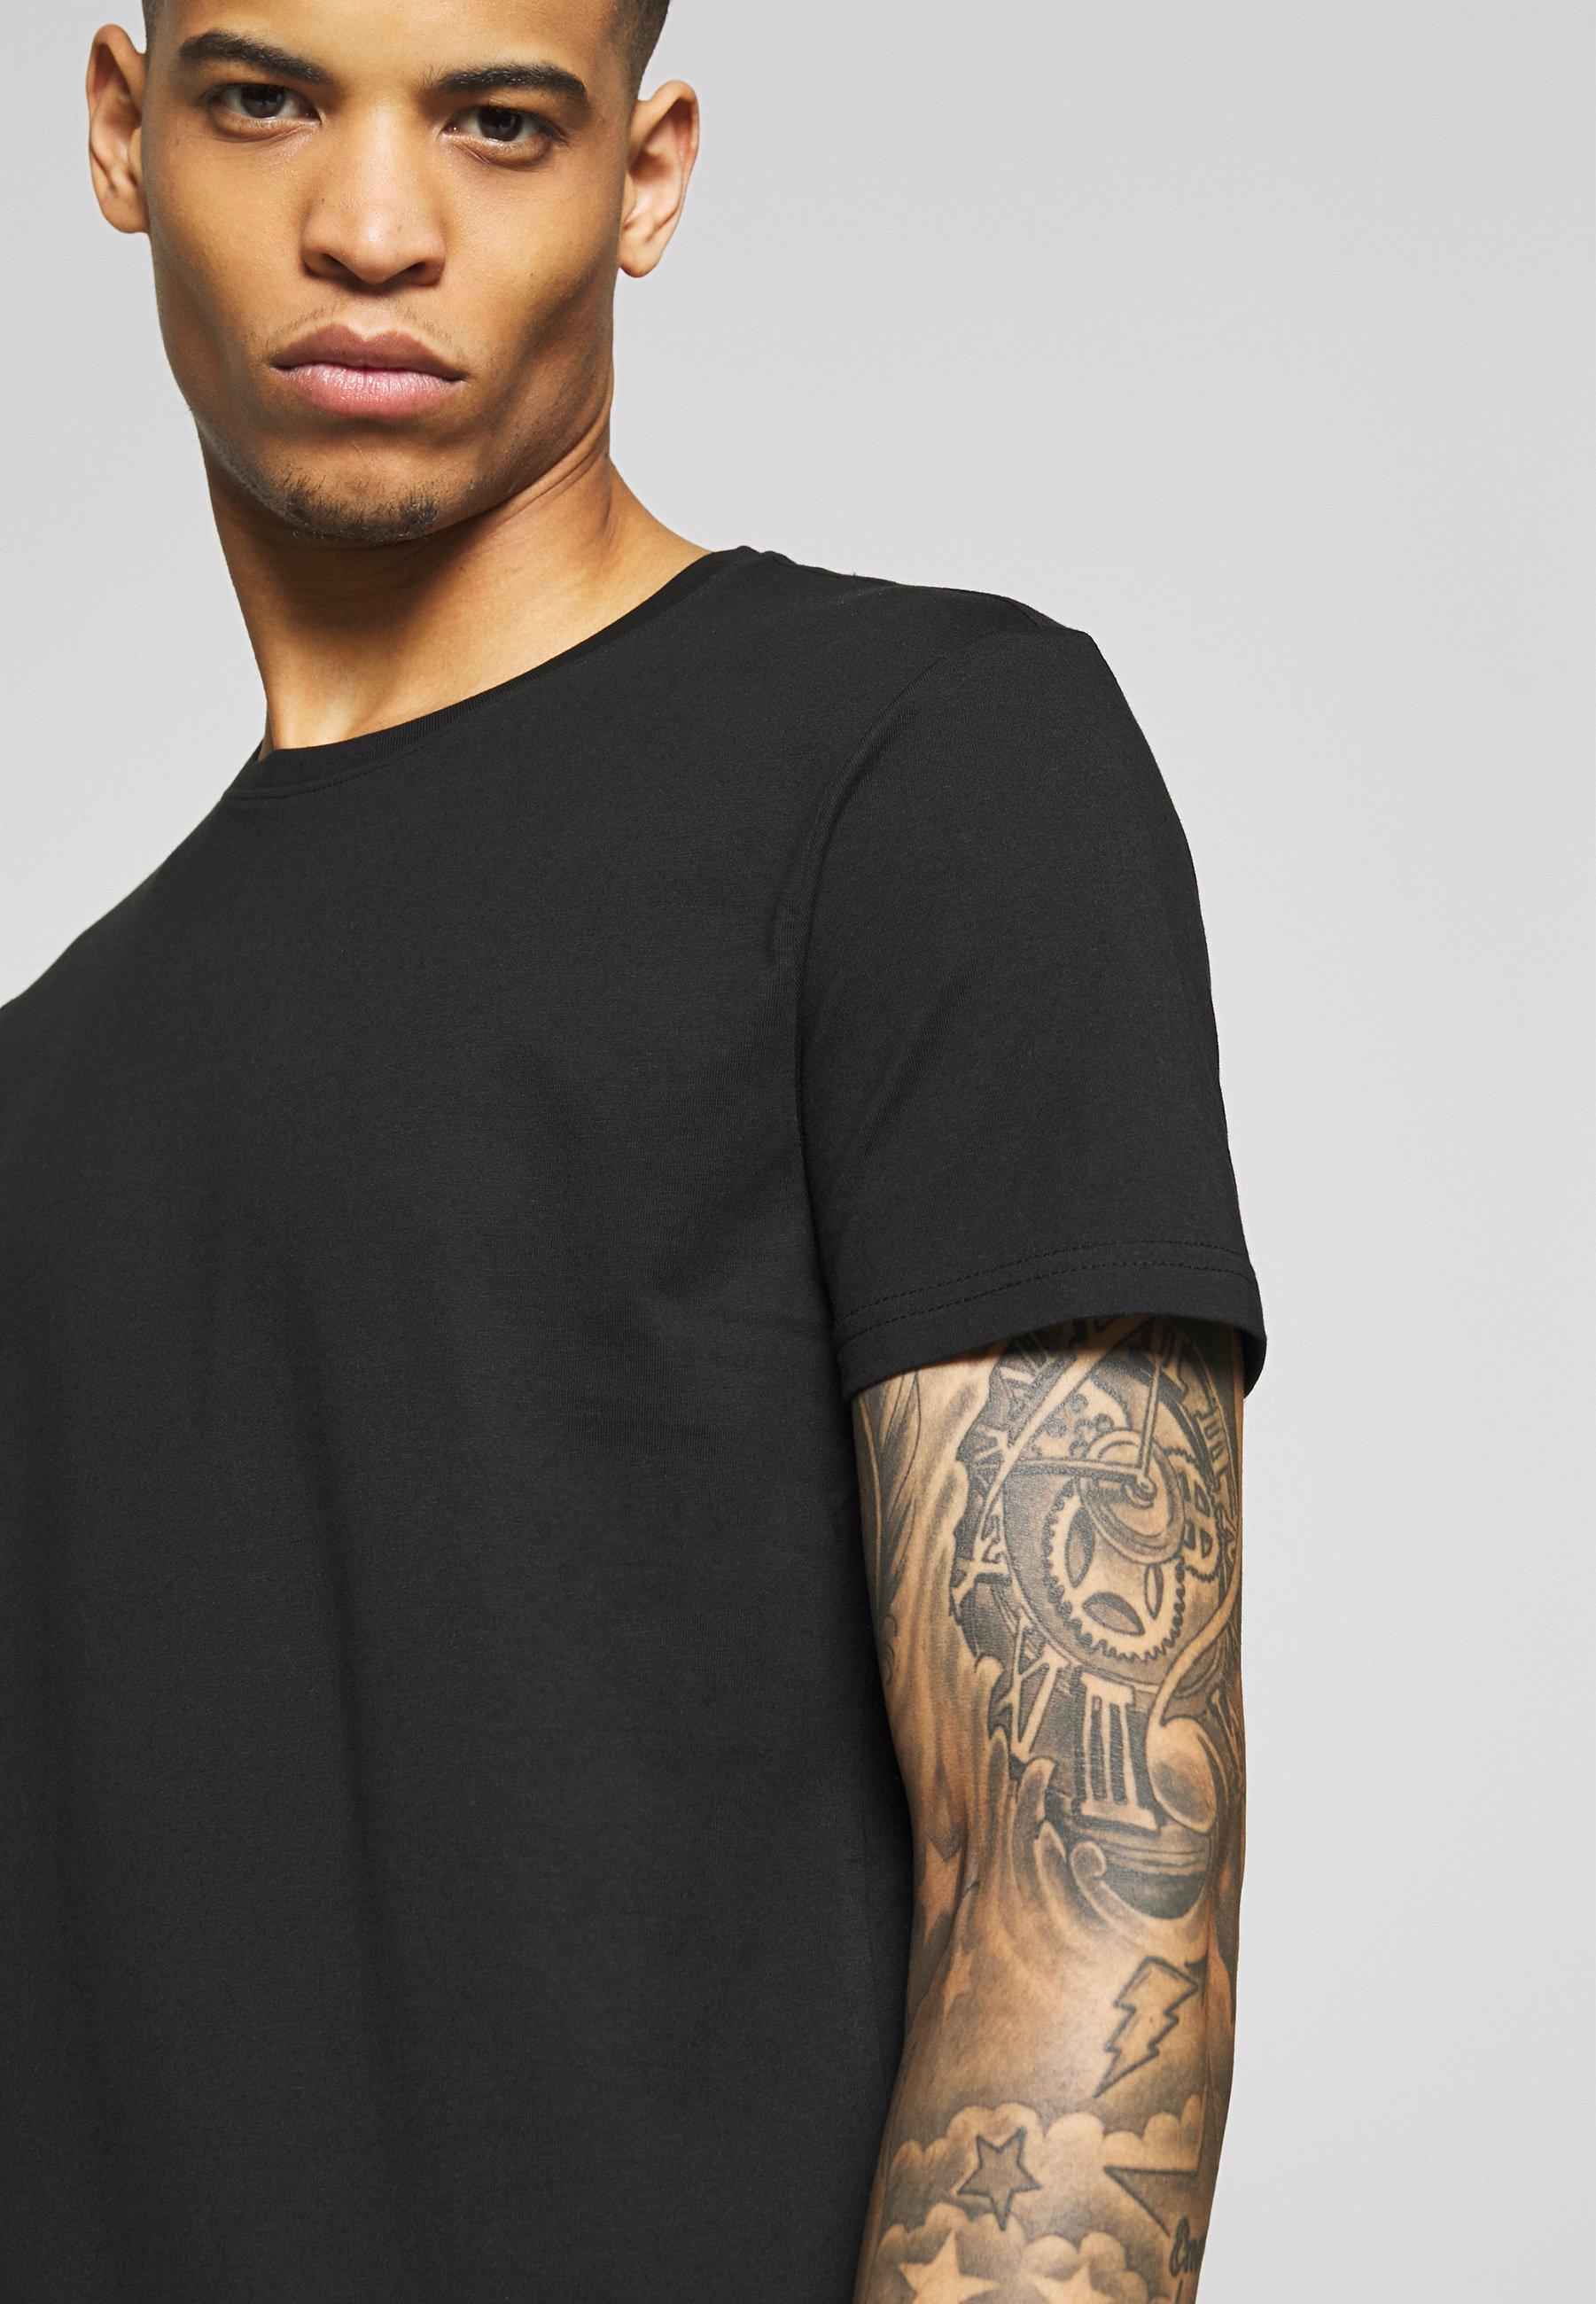 Pier One 3 Pack - T-shirts Black/ White/svart